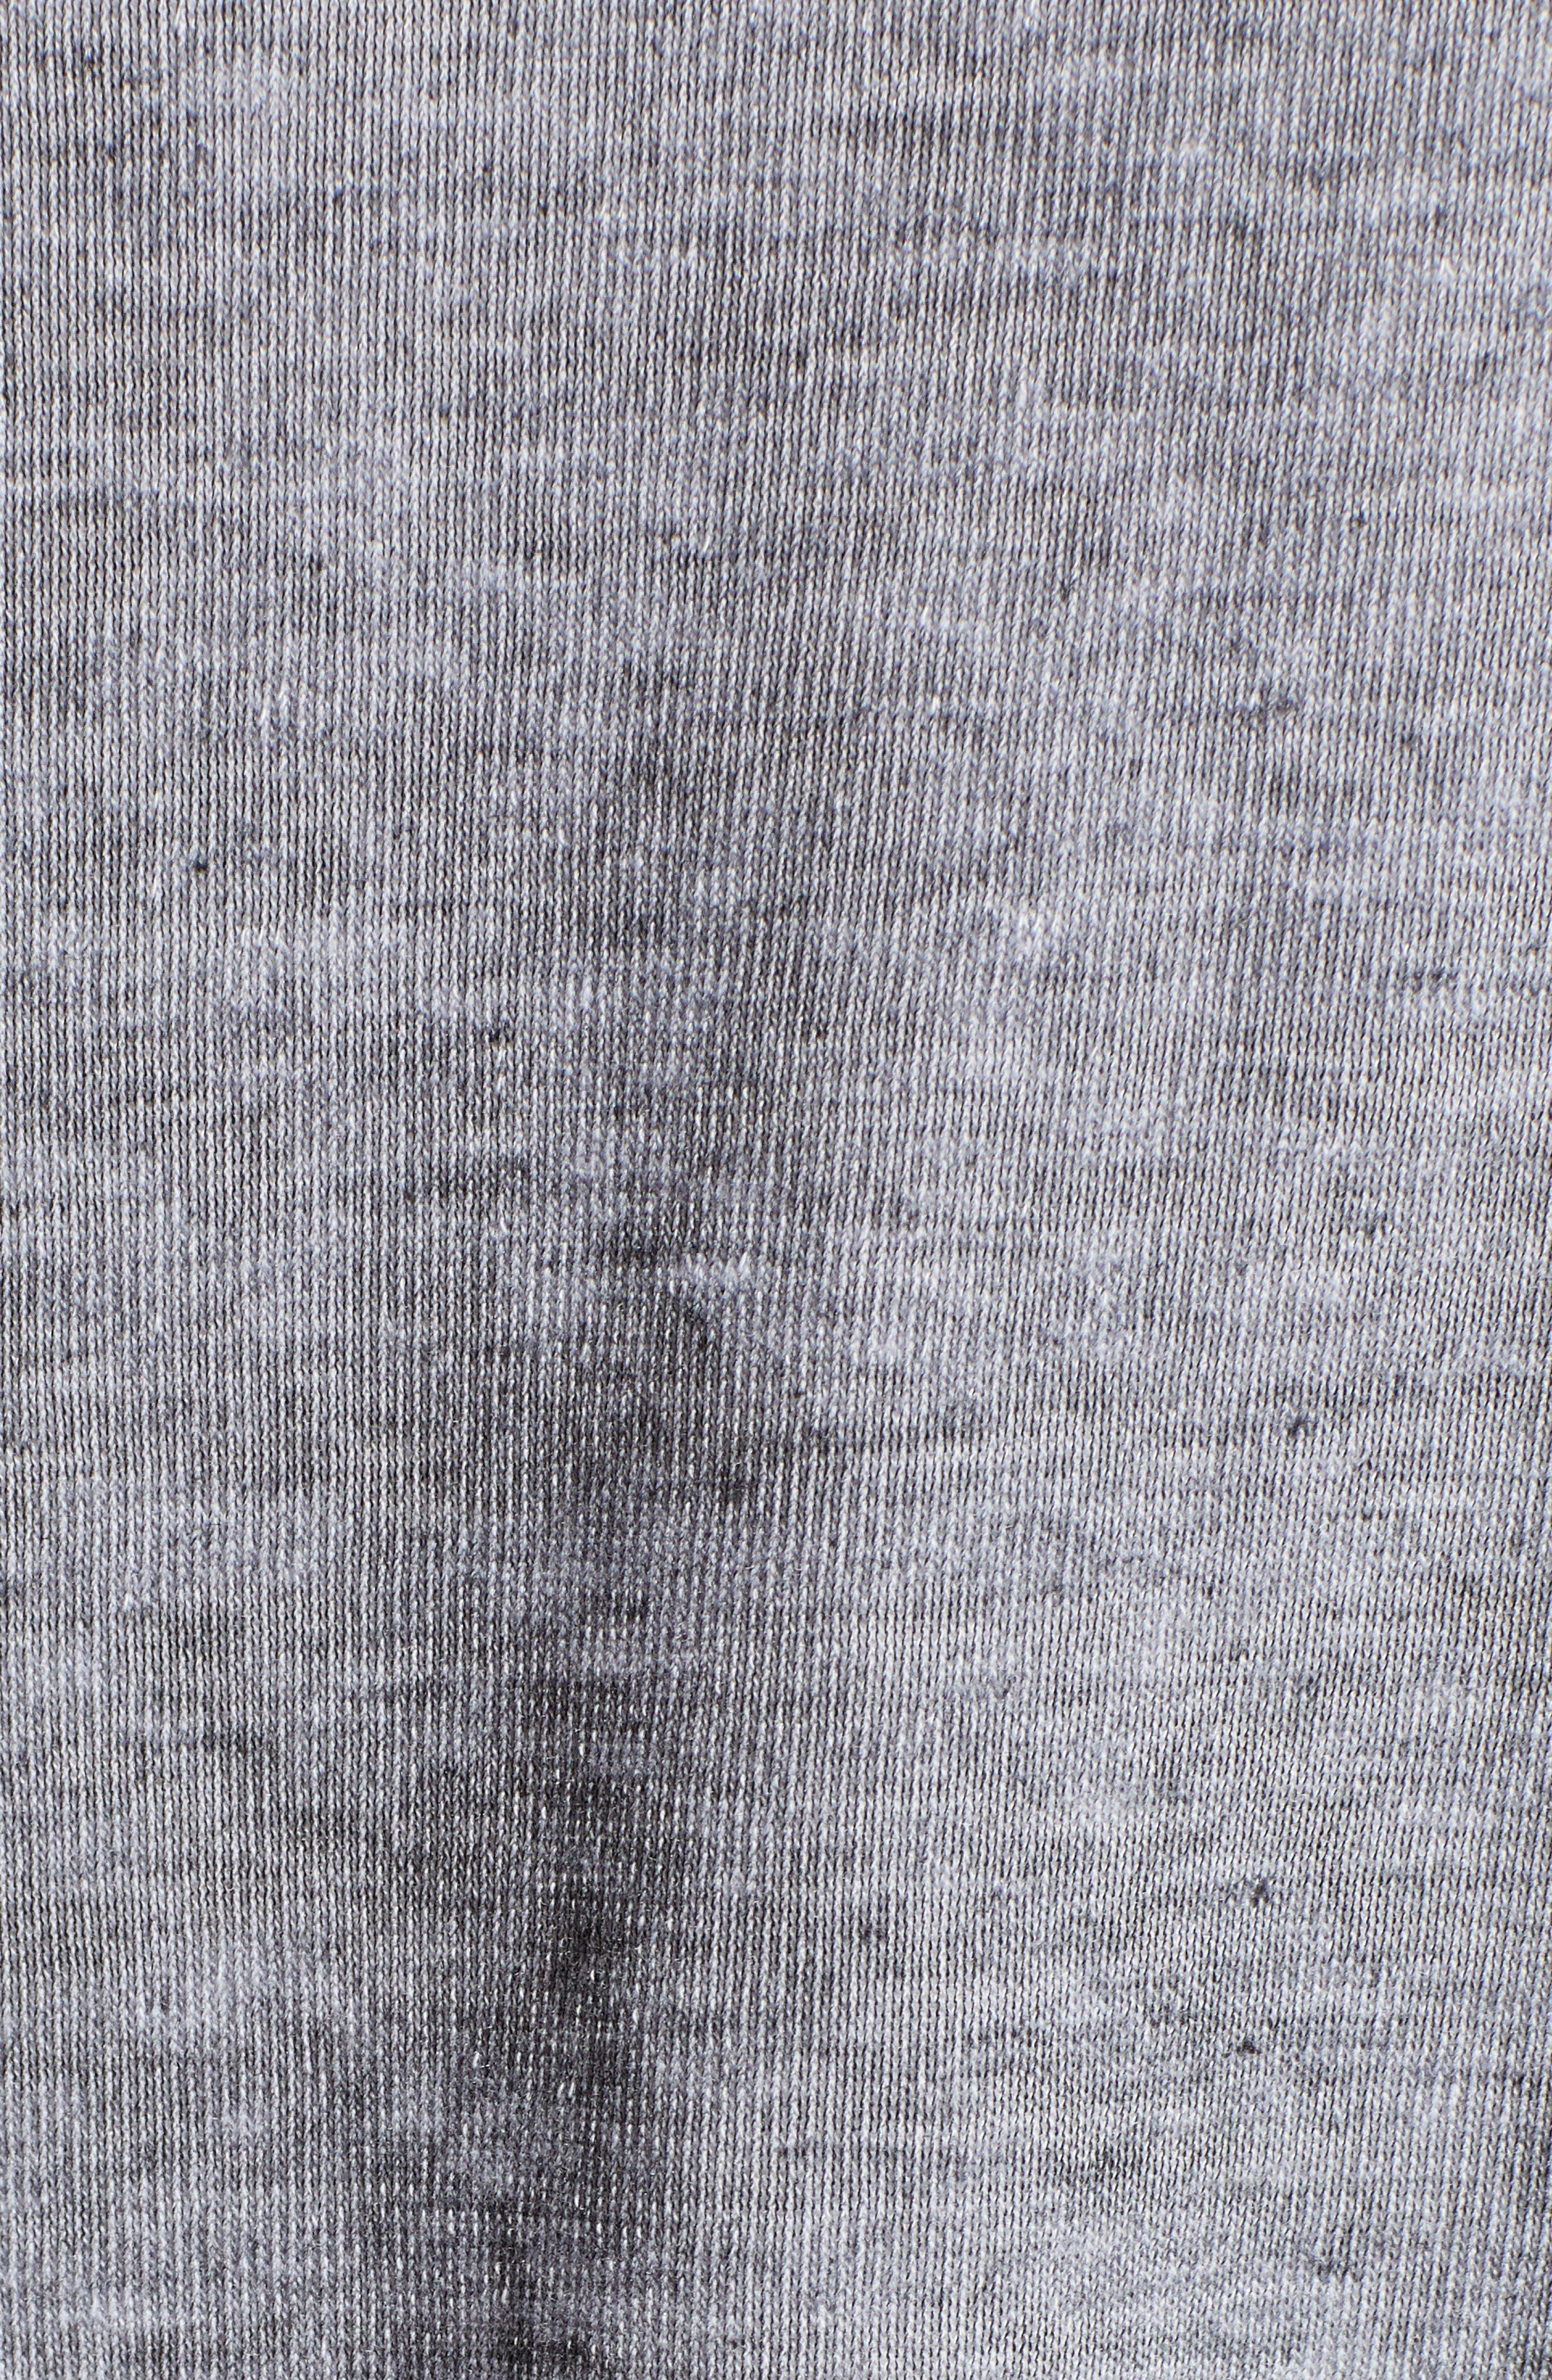 X-Ray Vision Road Trip Sweatshirt,                             Alternate thumbnail 5, color,                             020